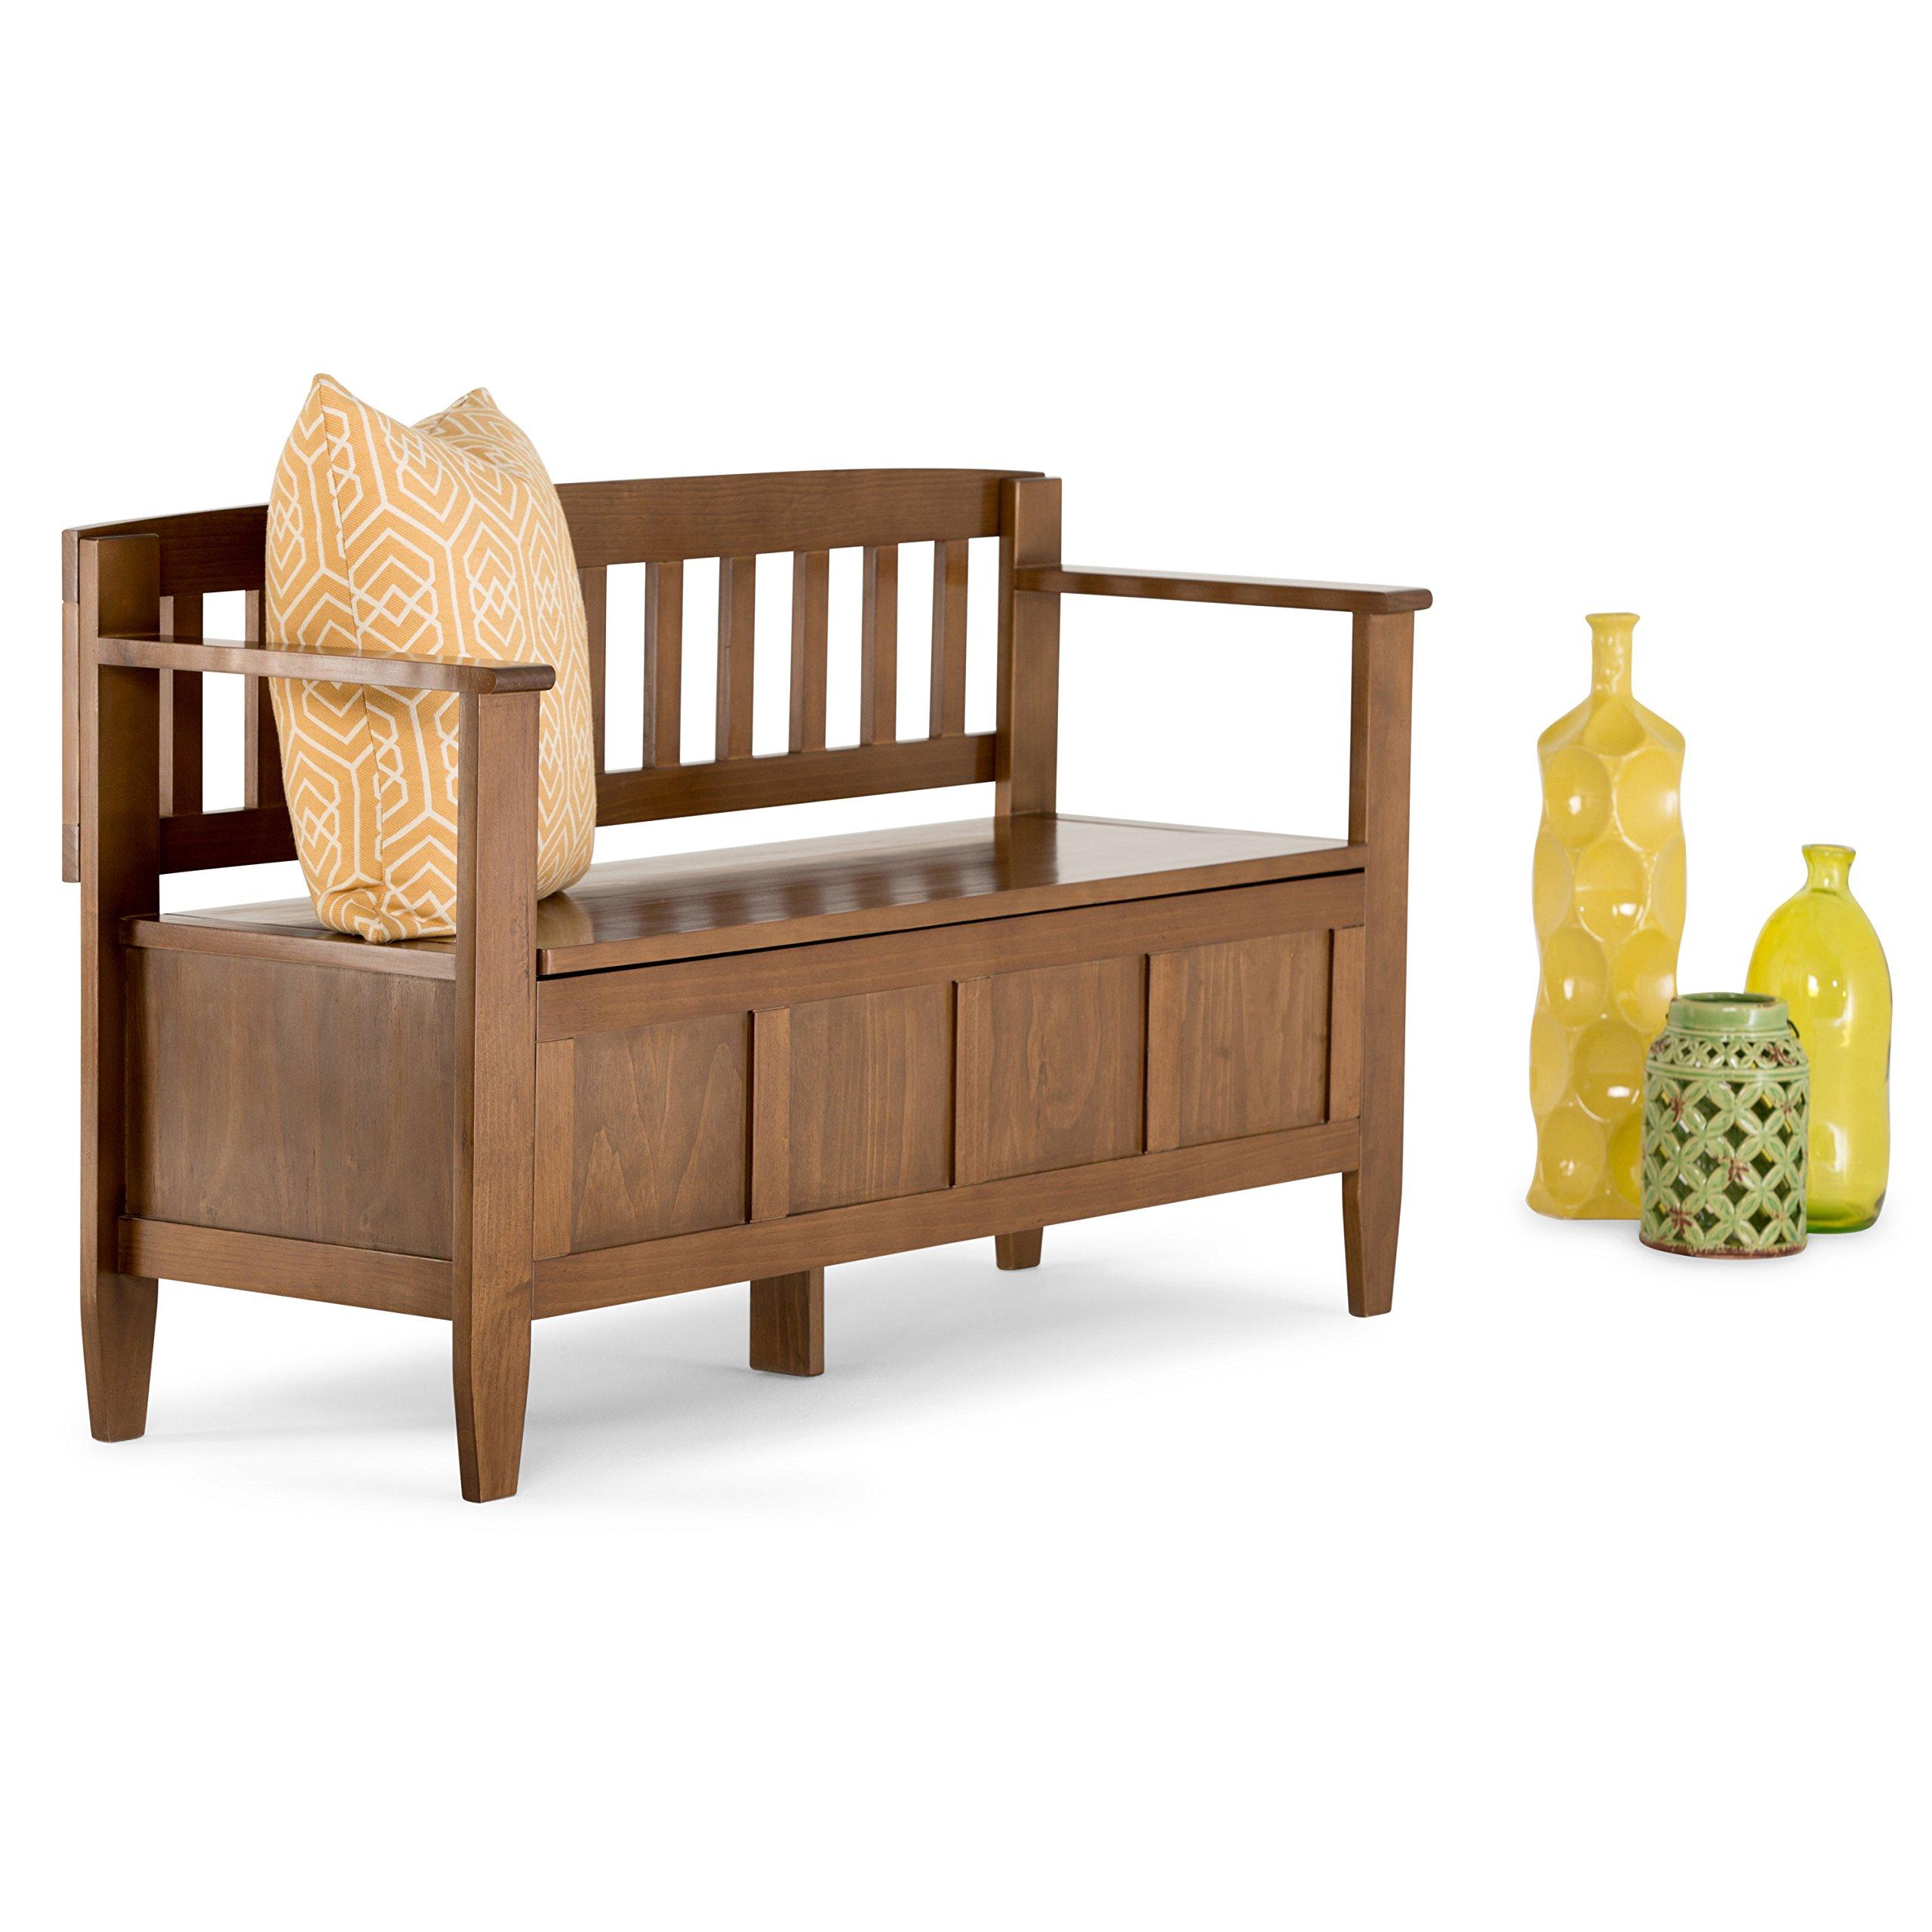 Simpli Home Brooklyn Solid Wood Entryway Storage Bench, Medium Saddle Brown by Simpli Home (Image #2)